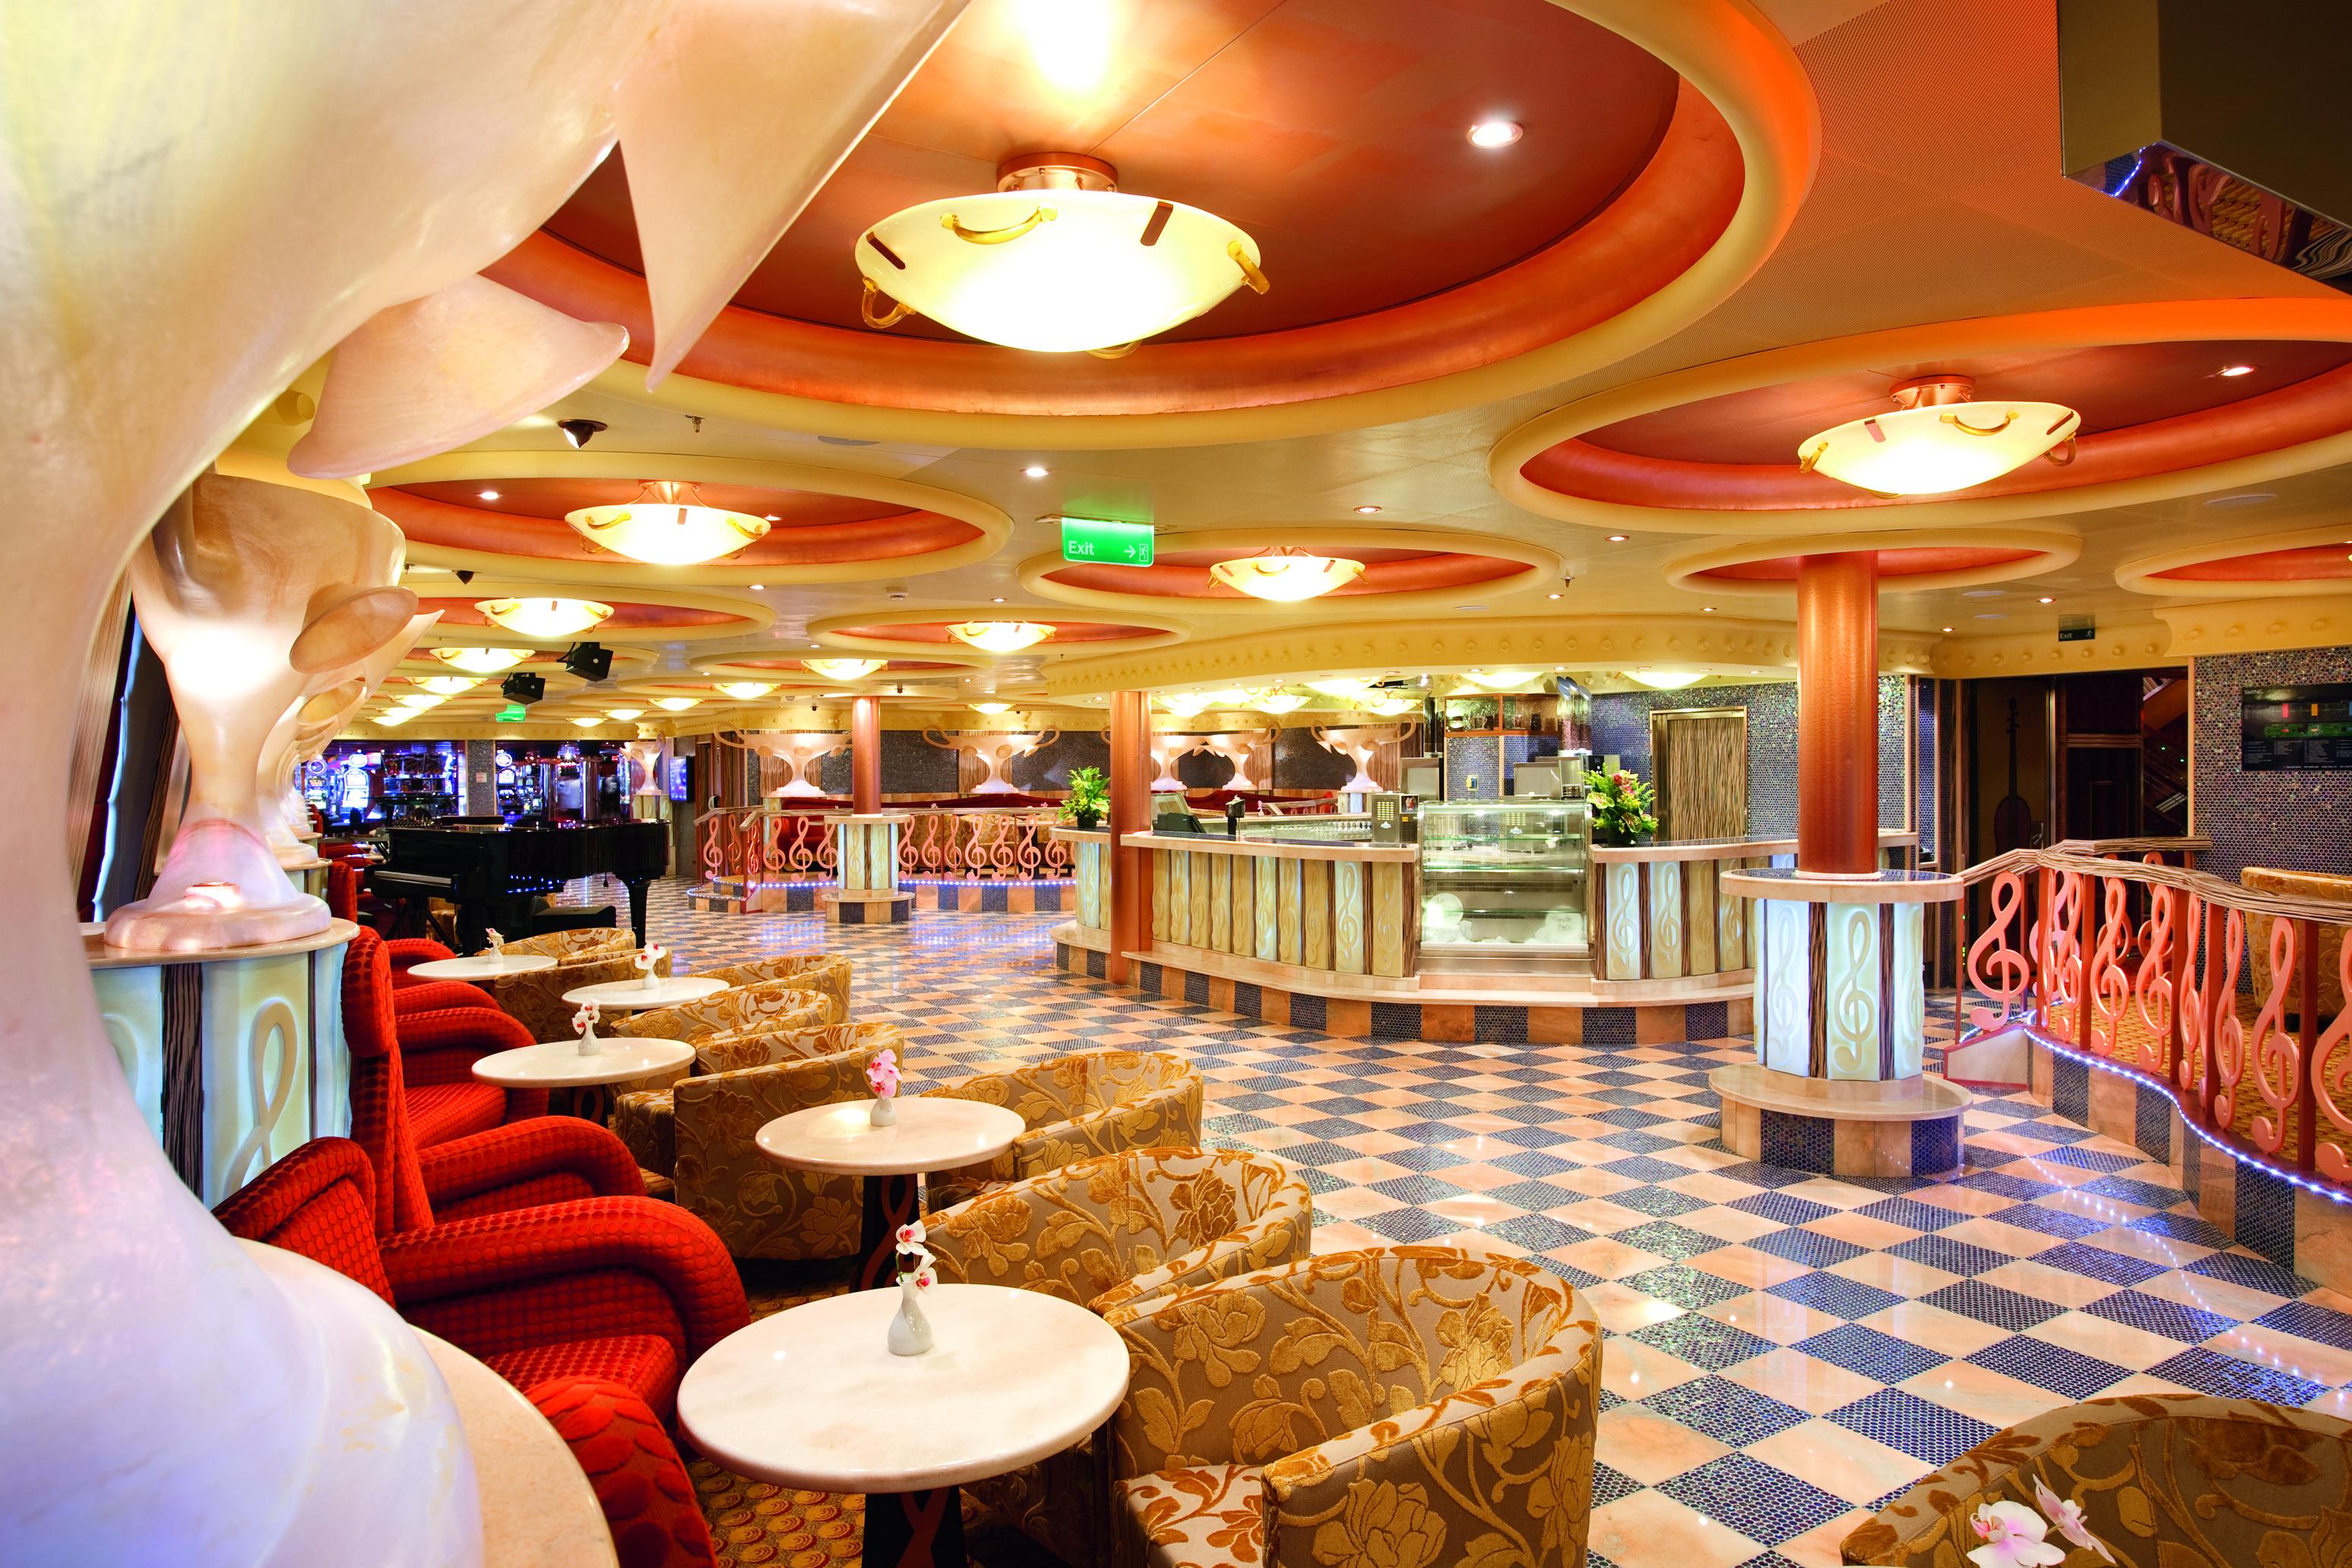 Rondo Coffe Choclate Bar